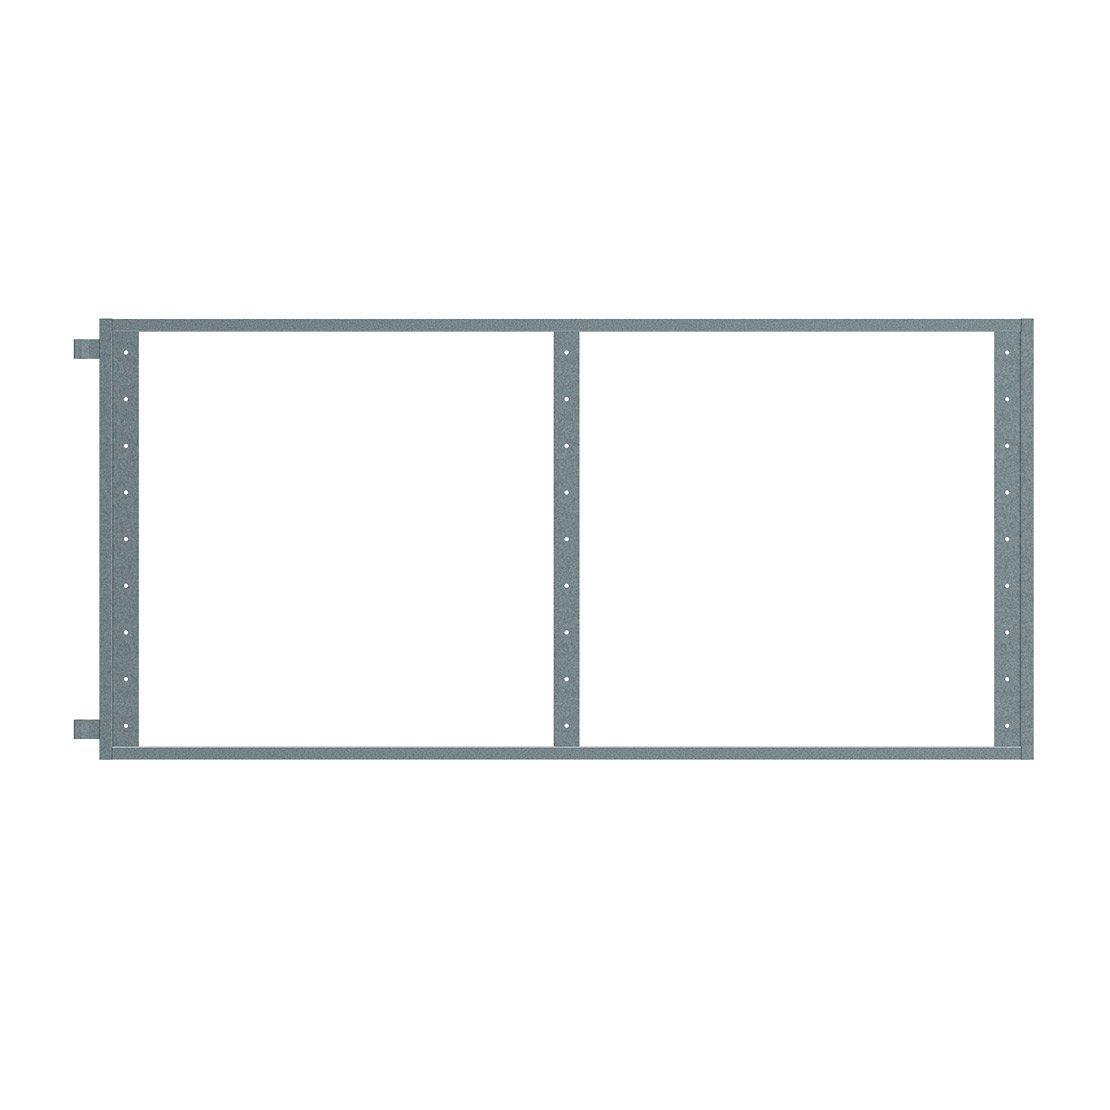 Sheepyard gate 1800mm x 850mm (frame only)